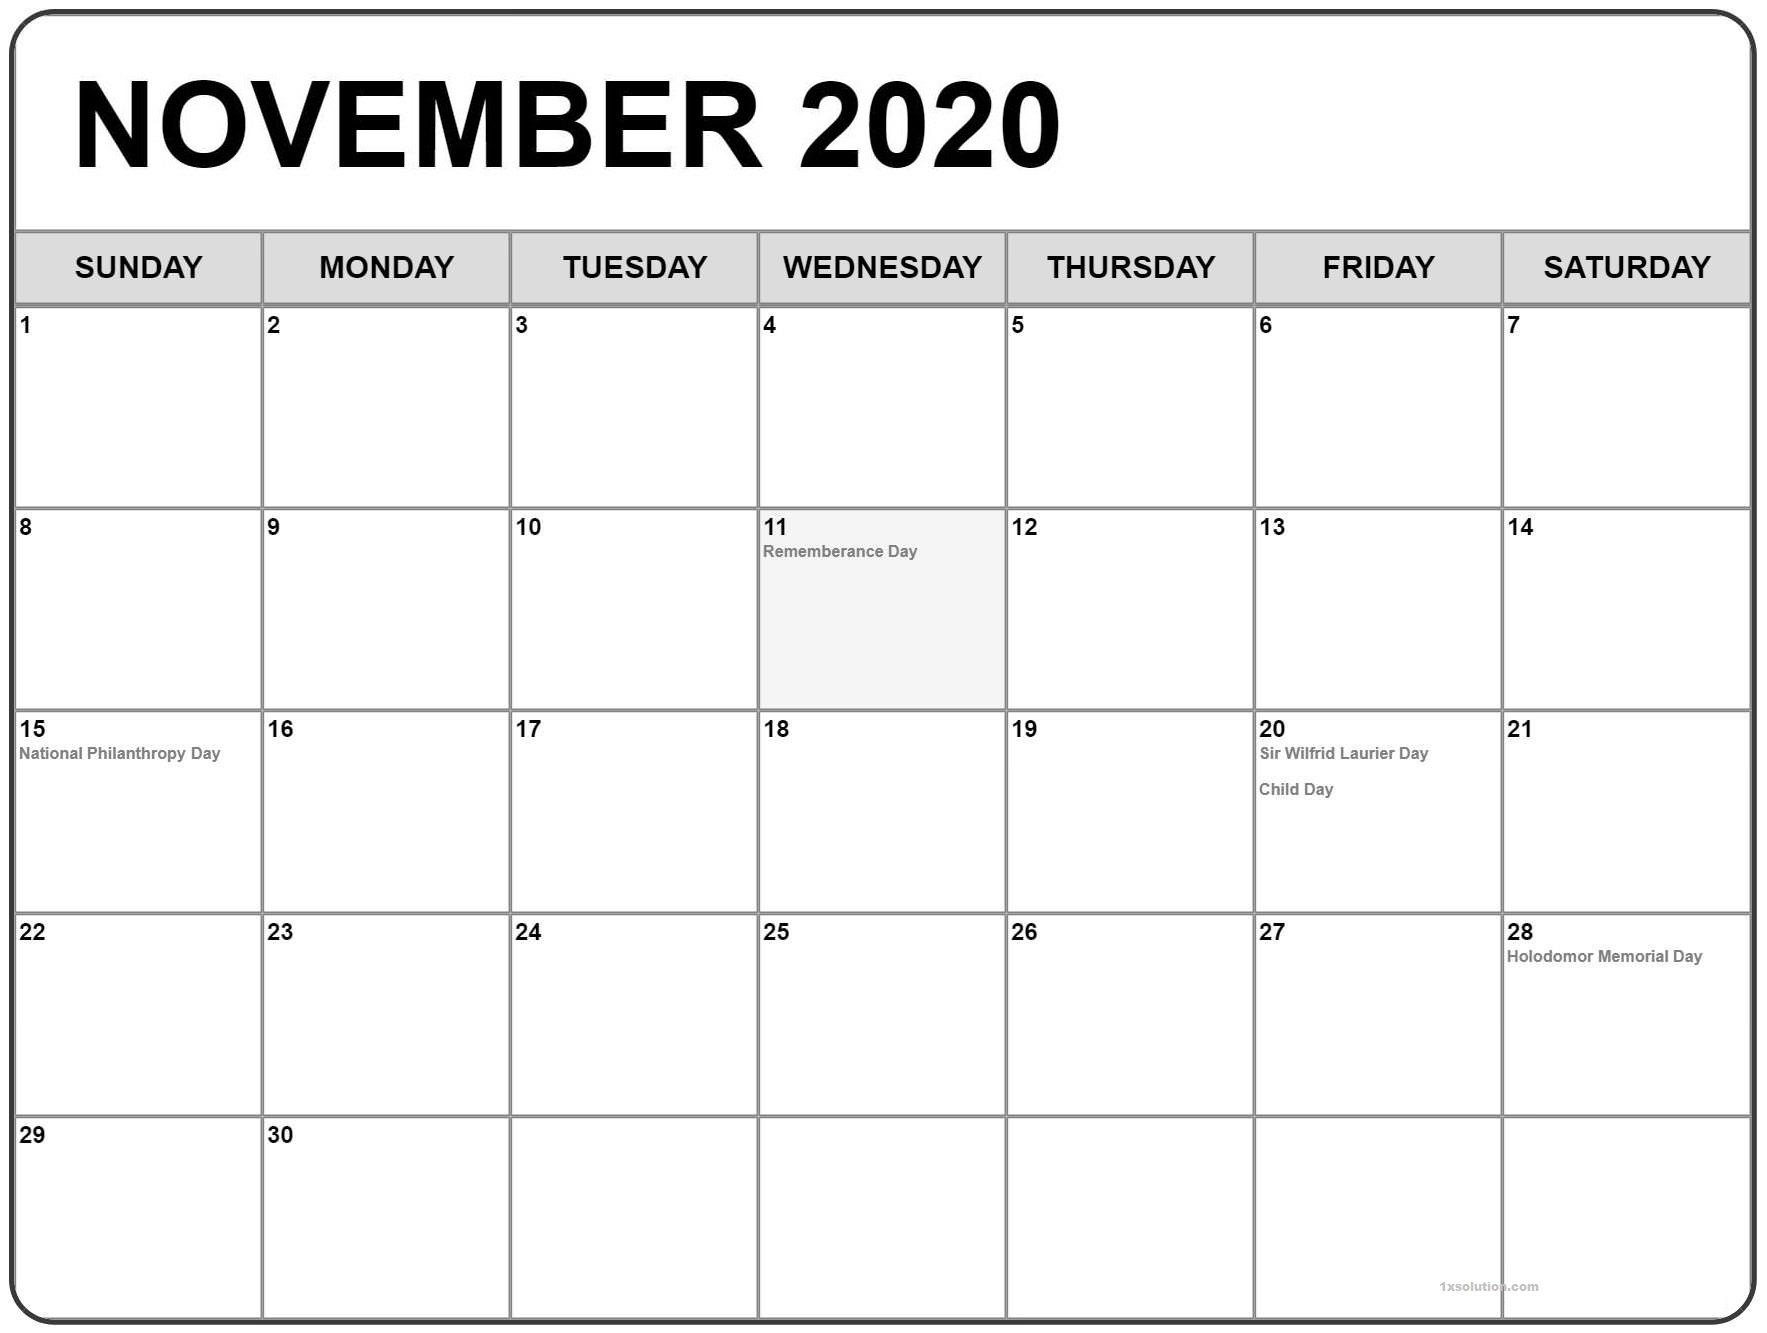 Daily November 2020 Calendar with Holidays